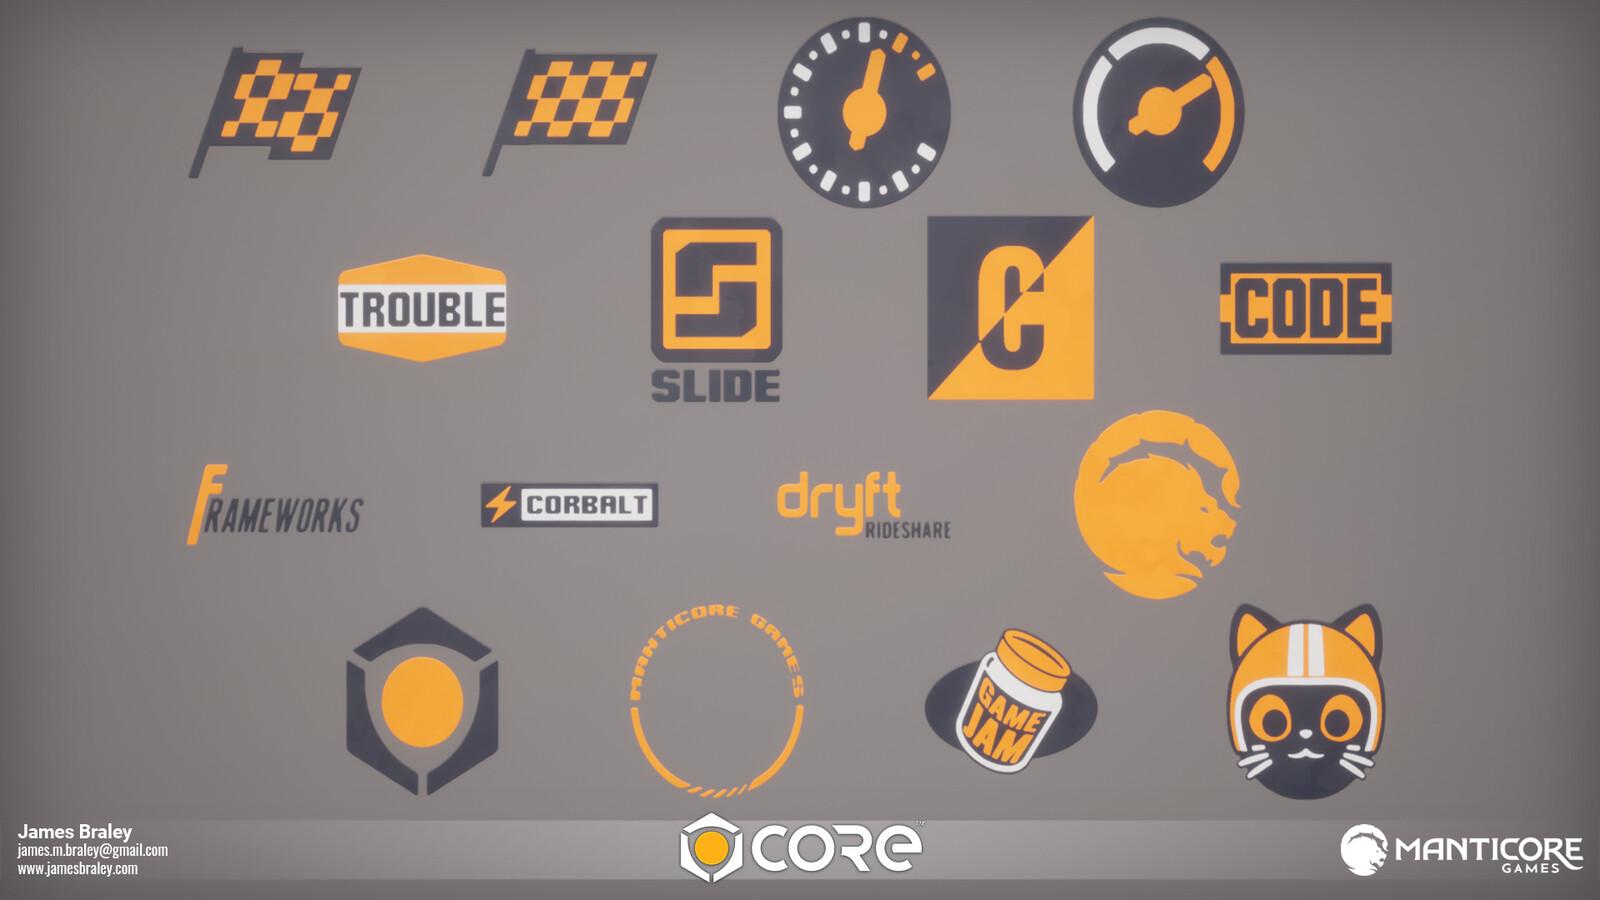 Racing Symbol Decals (Concepts by Jordan Louie)